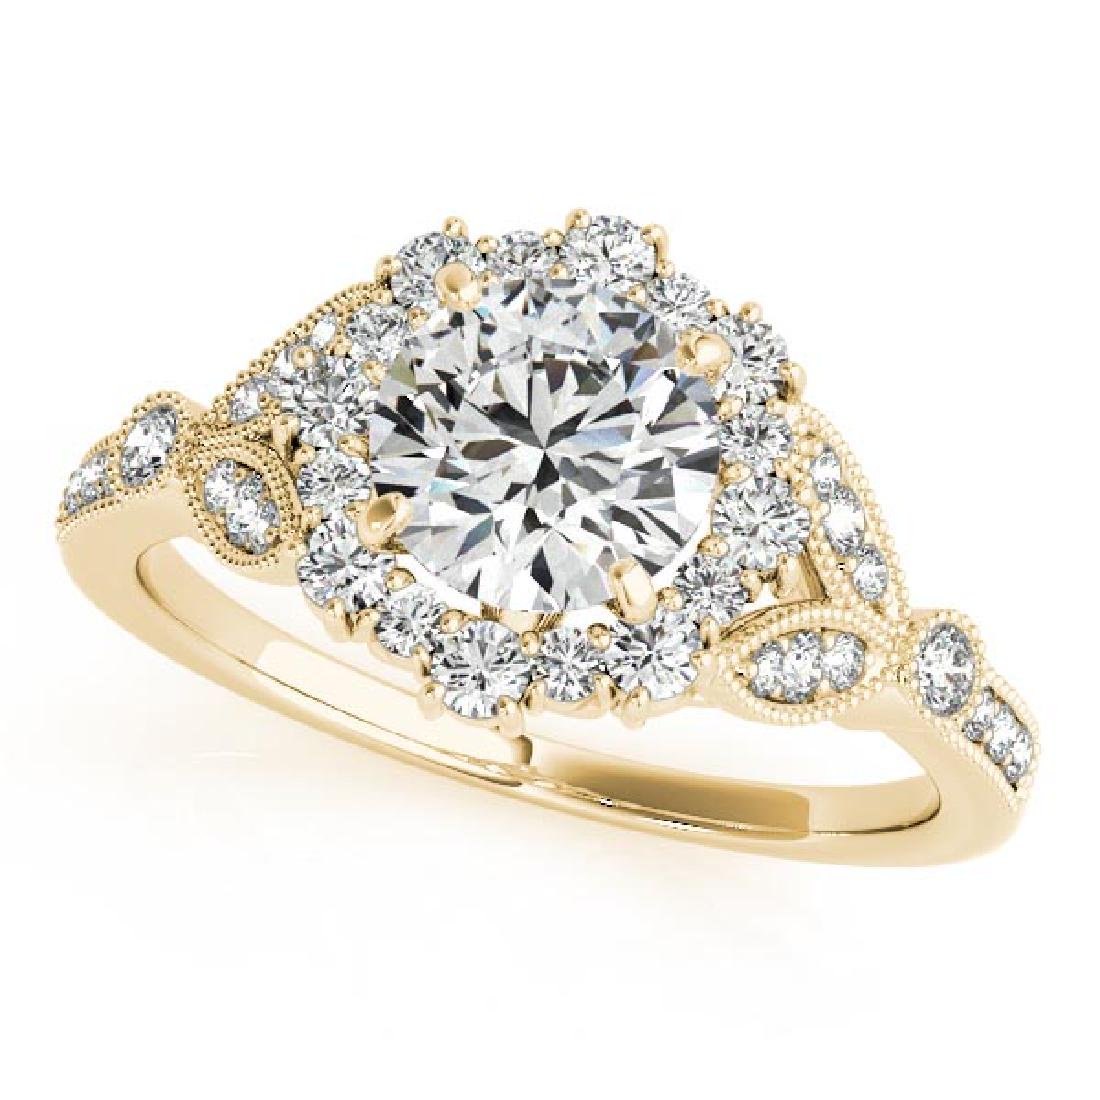 CERTIFIED 18K YELLOW GOLD 1.13 CT G-H/VS-SI1 DIAMOND HA